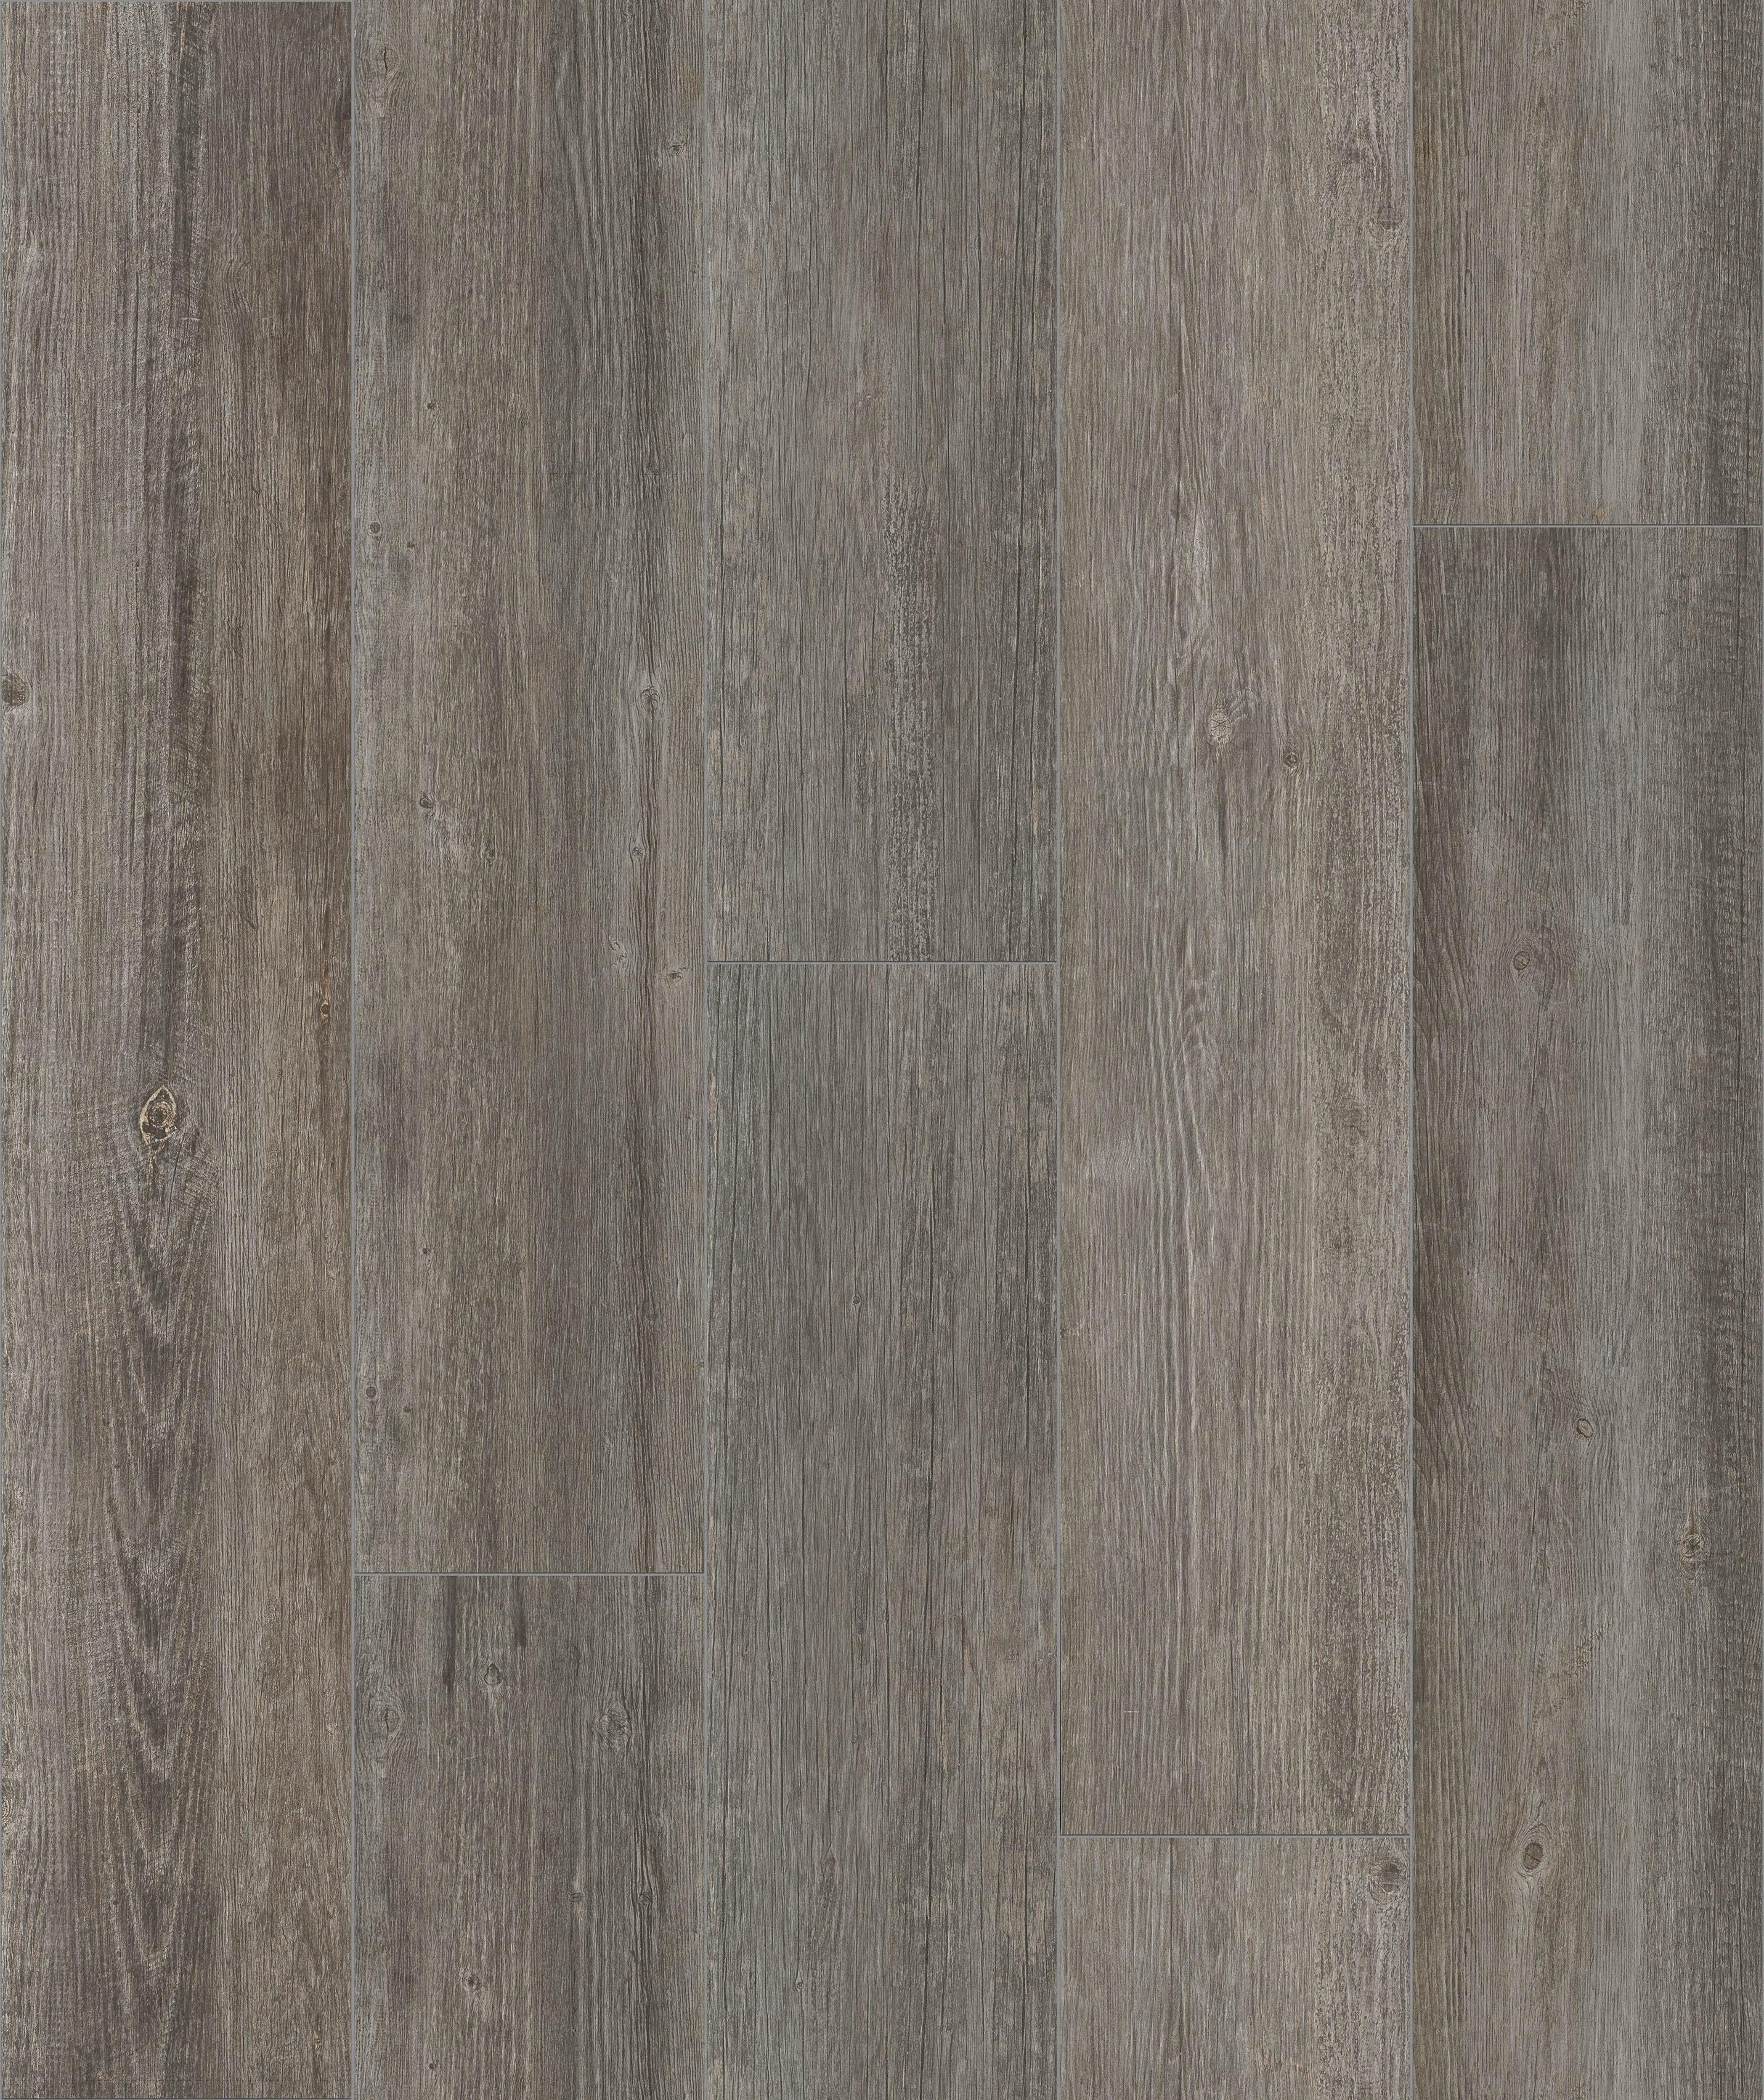 tilestone ecowood road grey keramisch parket impermo